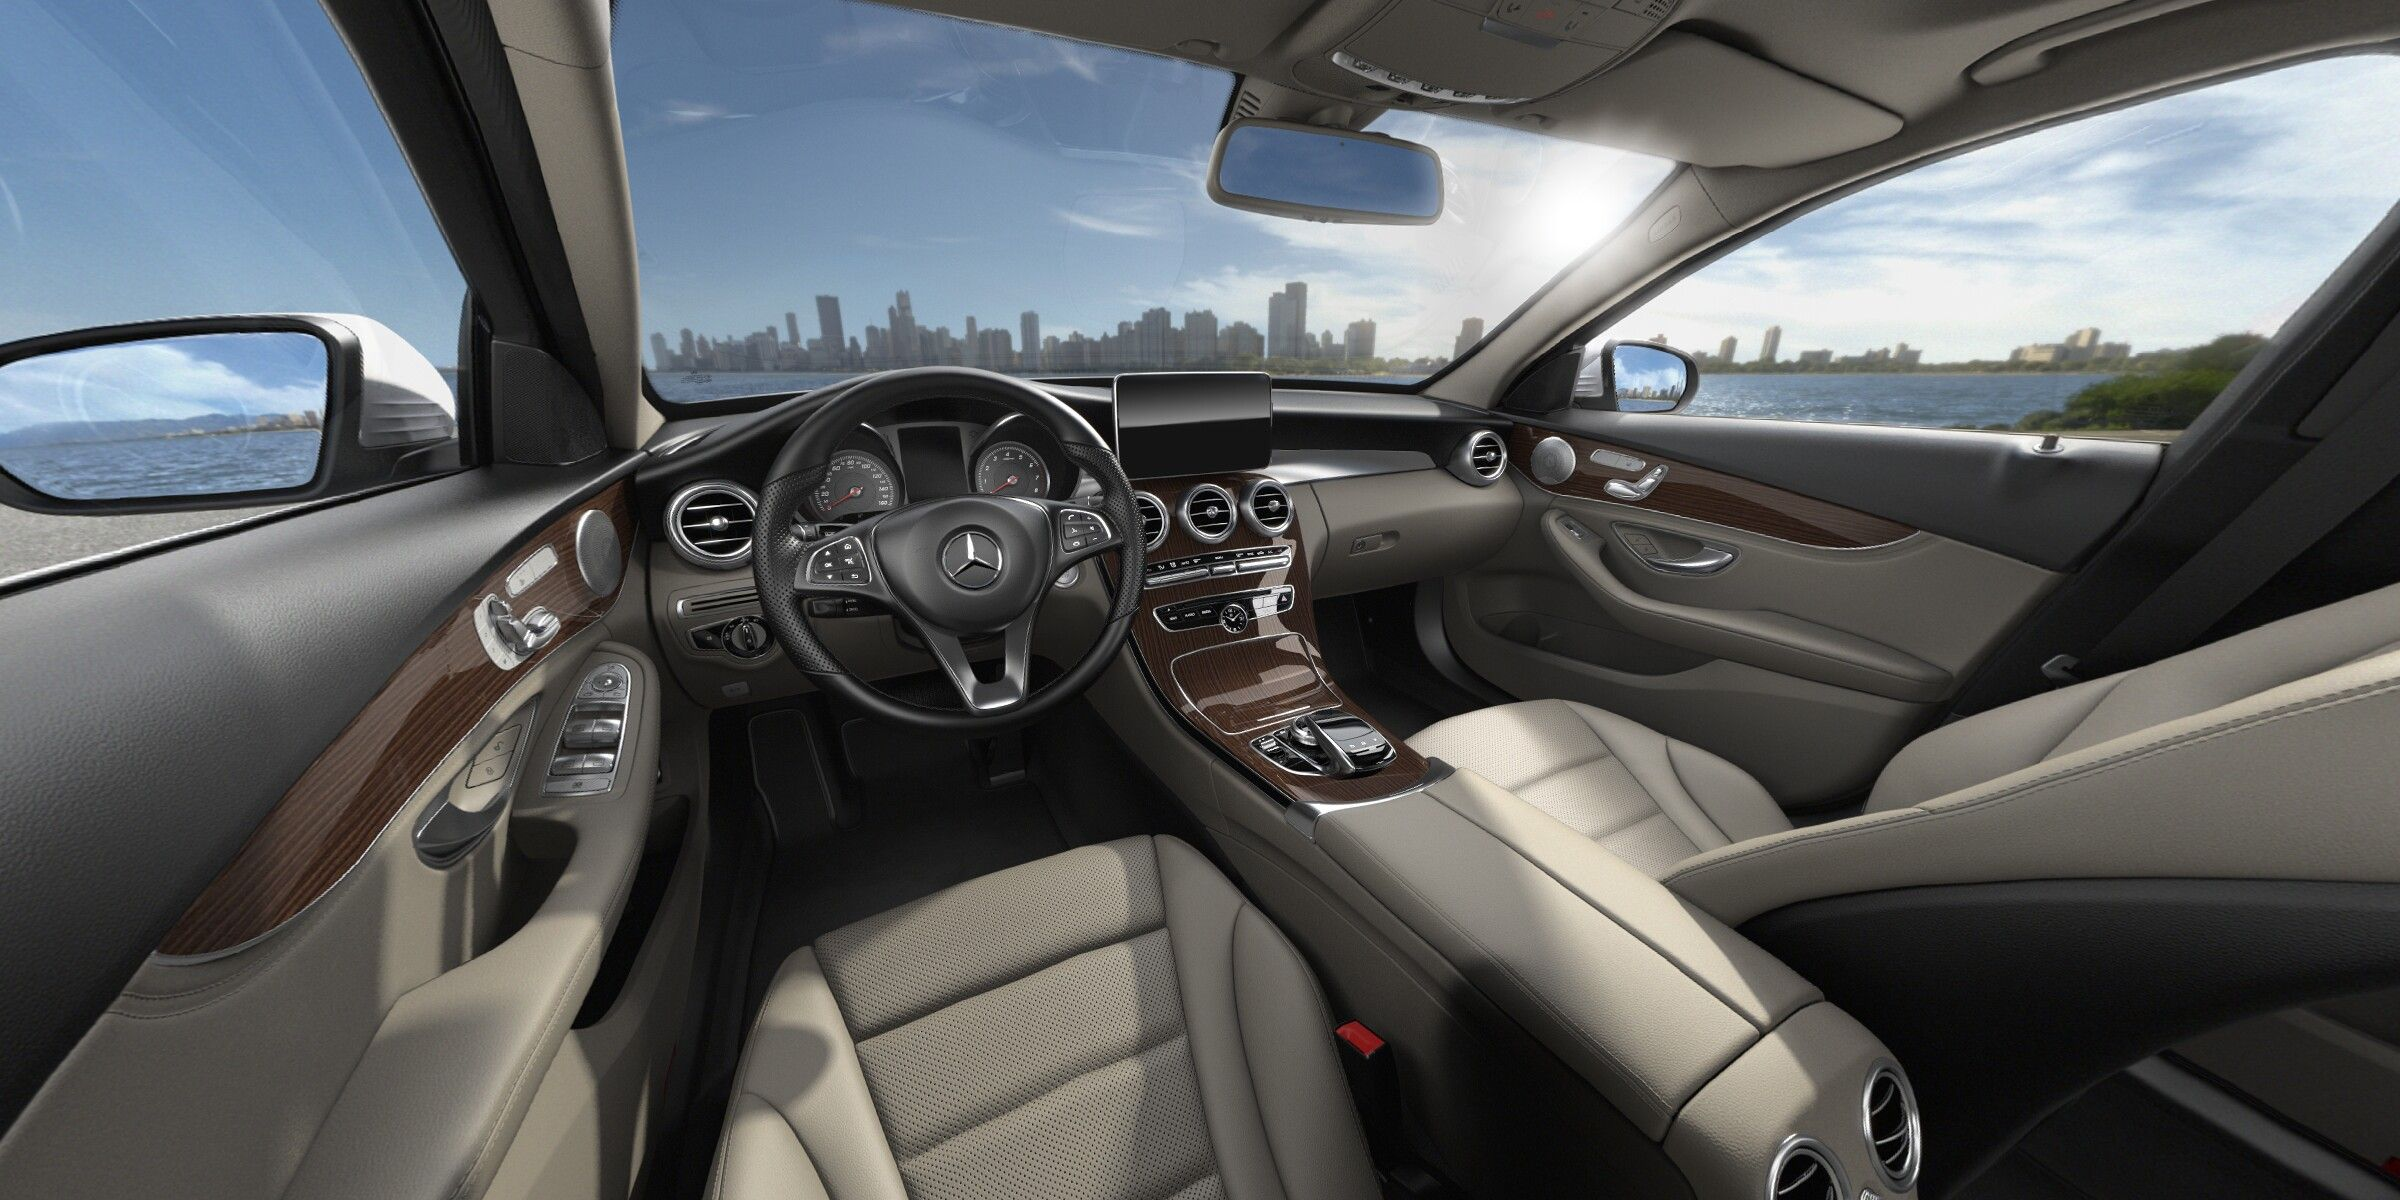 Choose your 2017 C300 4MATIC Sedan colors, trims, features